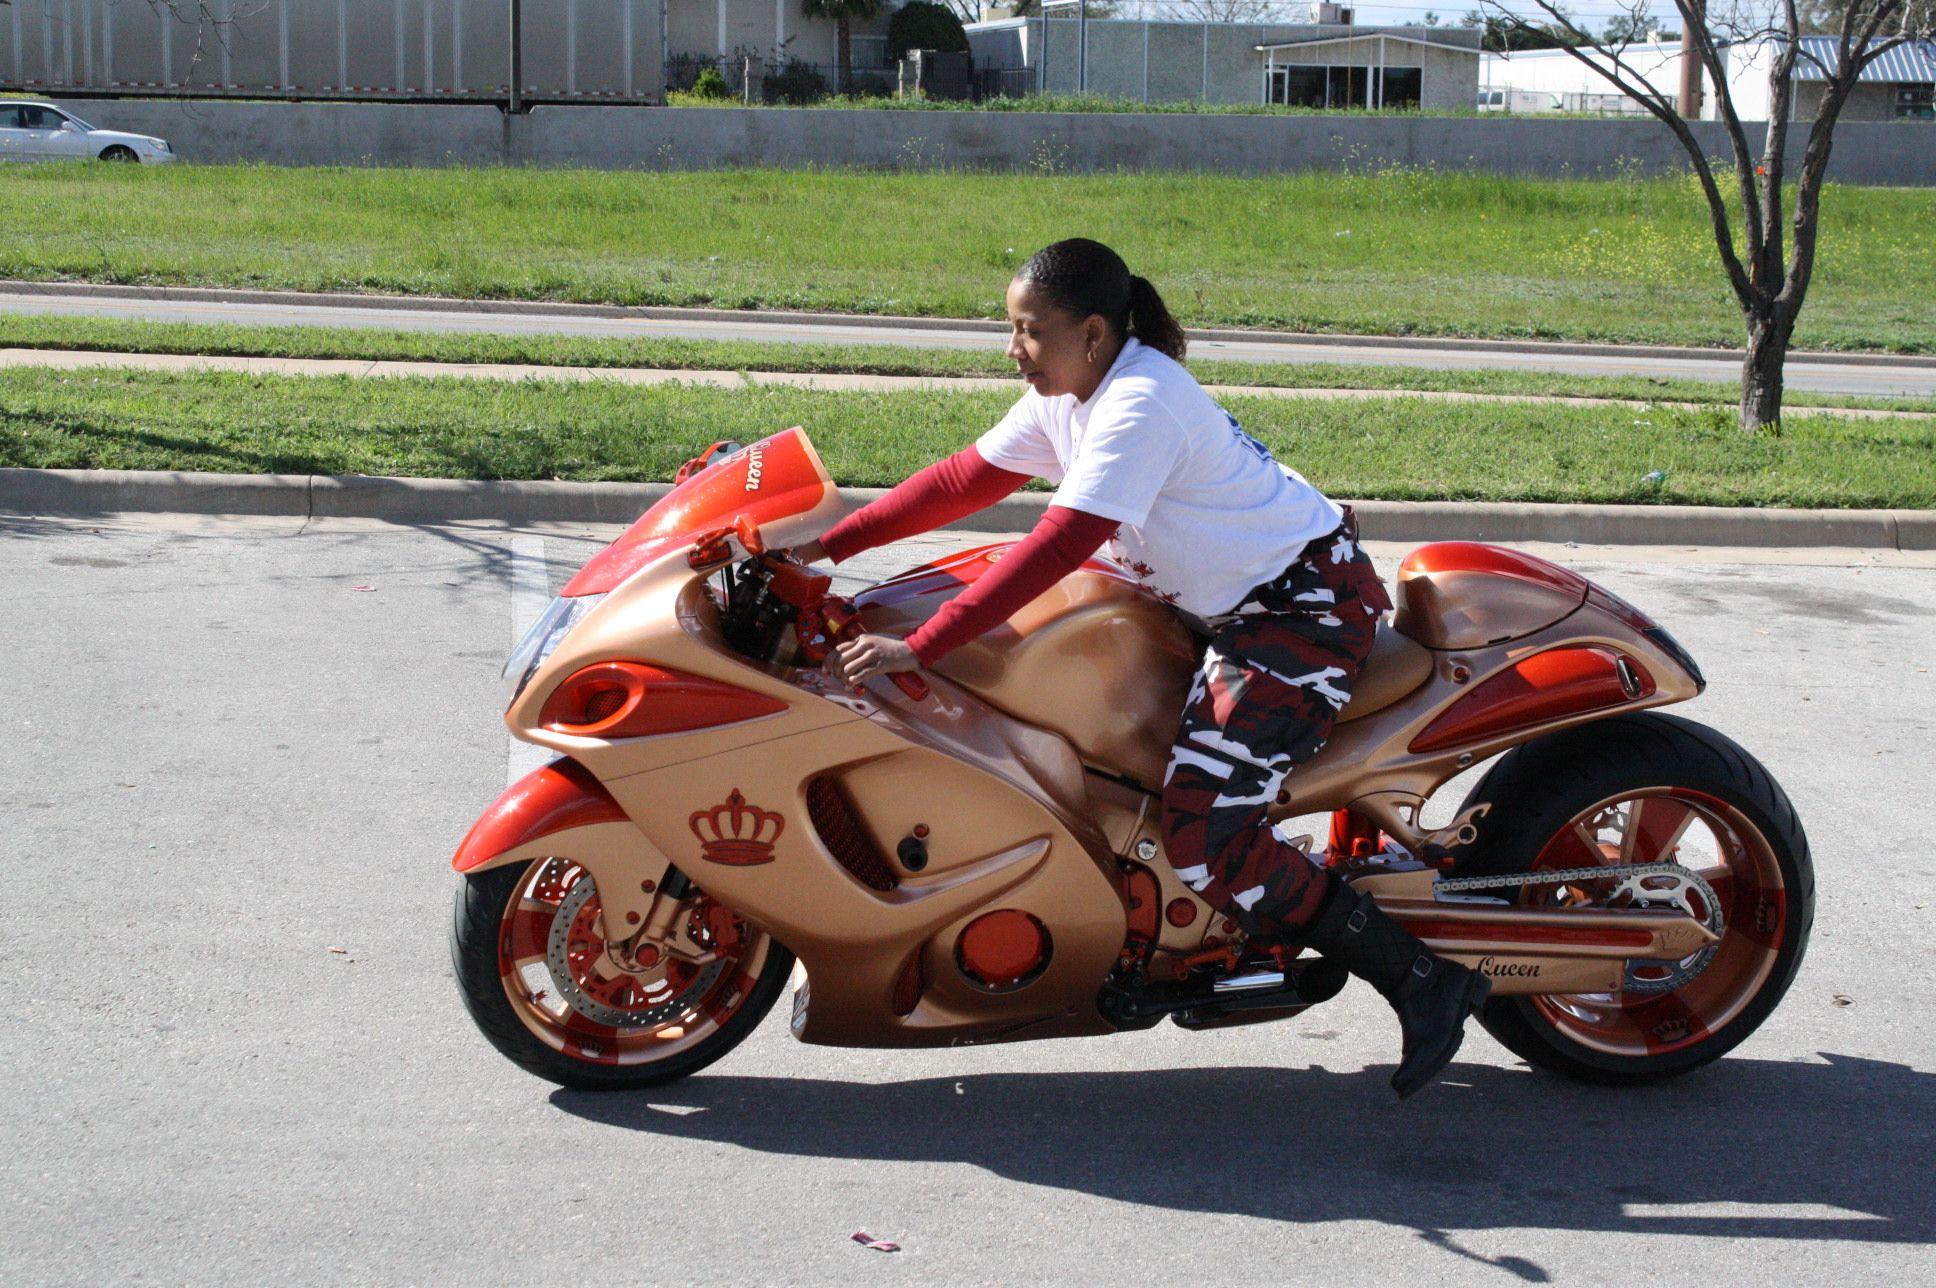 weird motorcycles google search freak bikes pinterest custom hayabusa custom sport. Black Bedroom Furniture Sets. Home Design Ideas